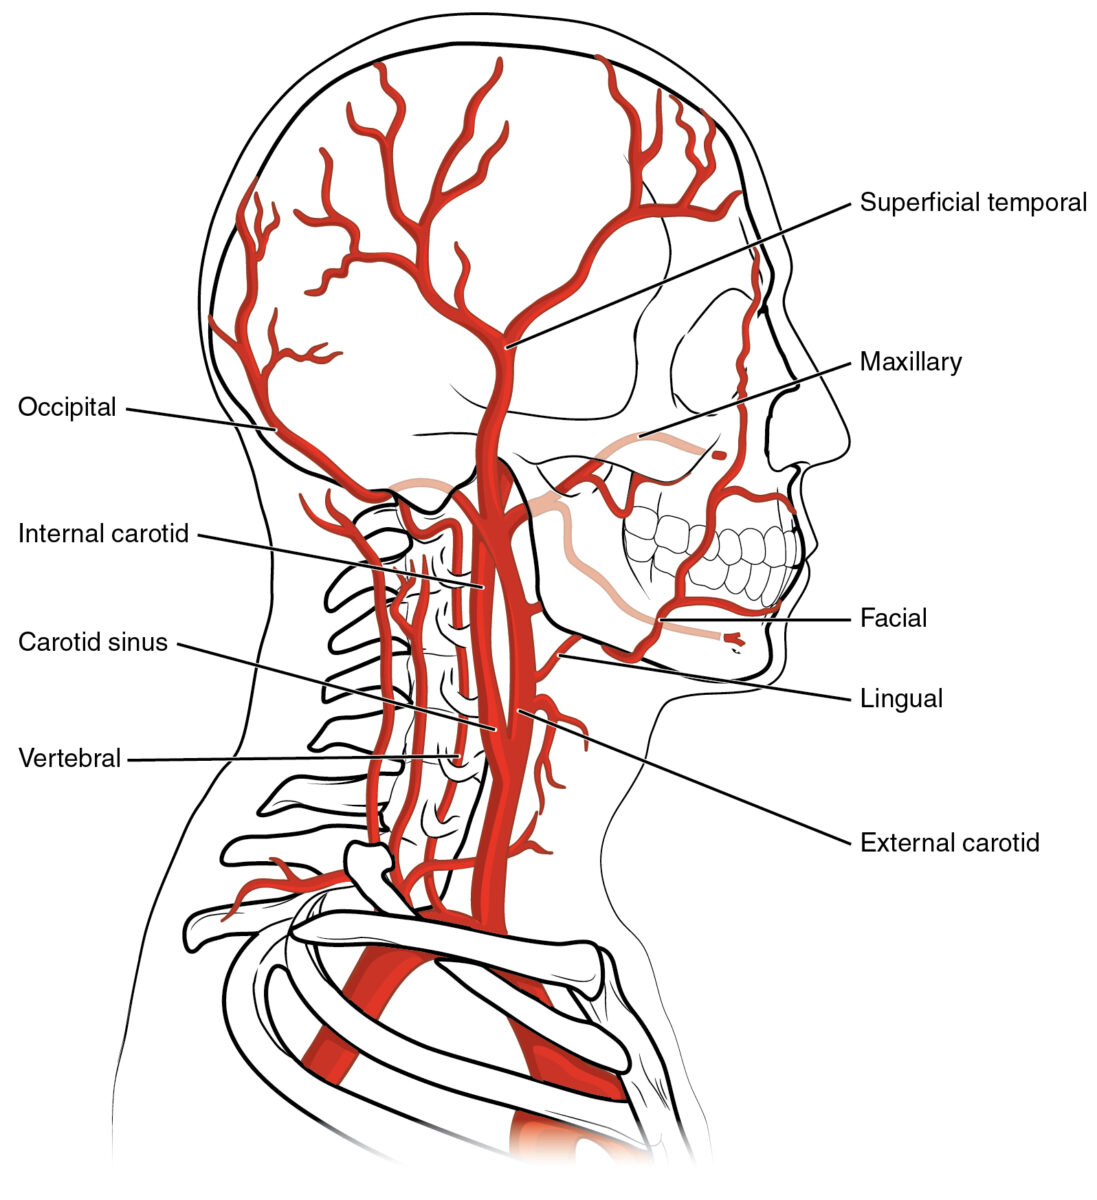 Facial artery branching off the external carotid artery